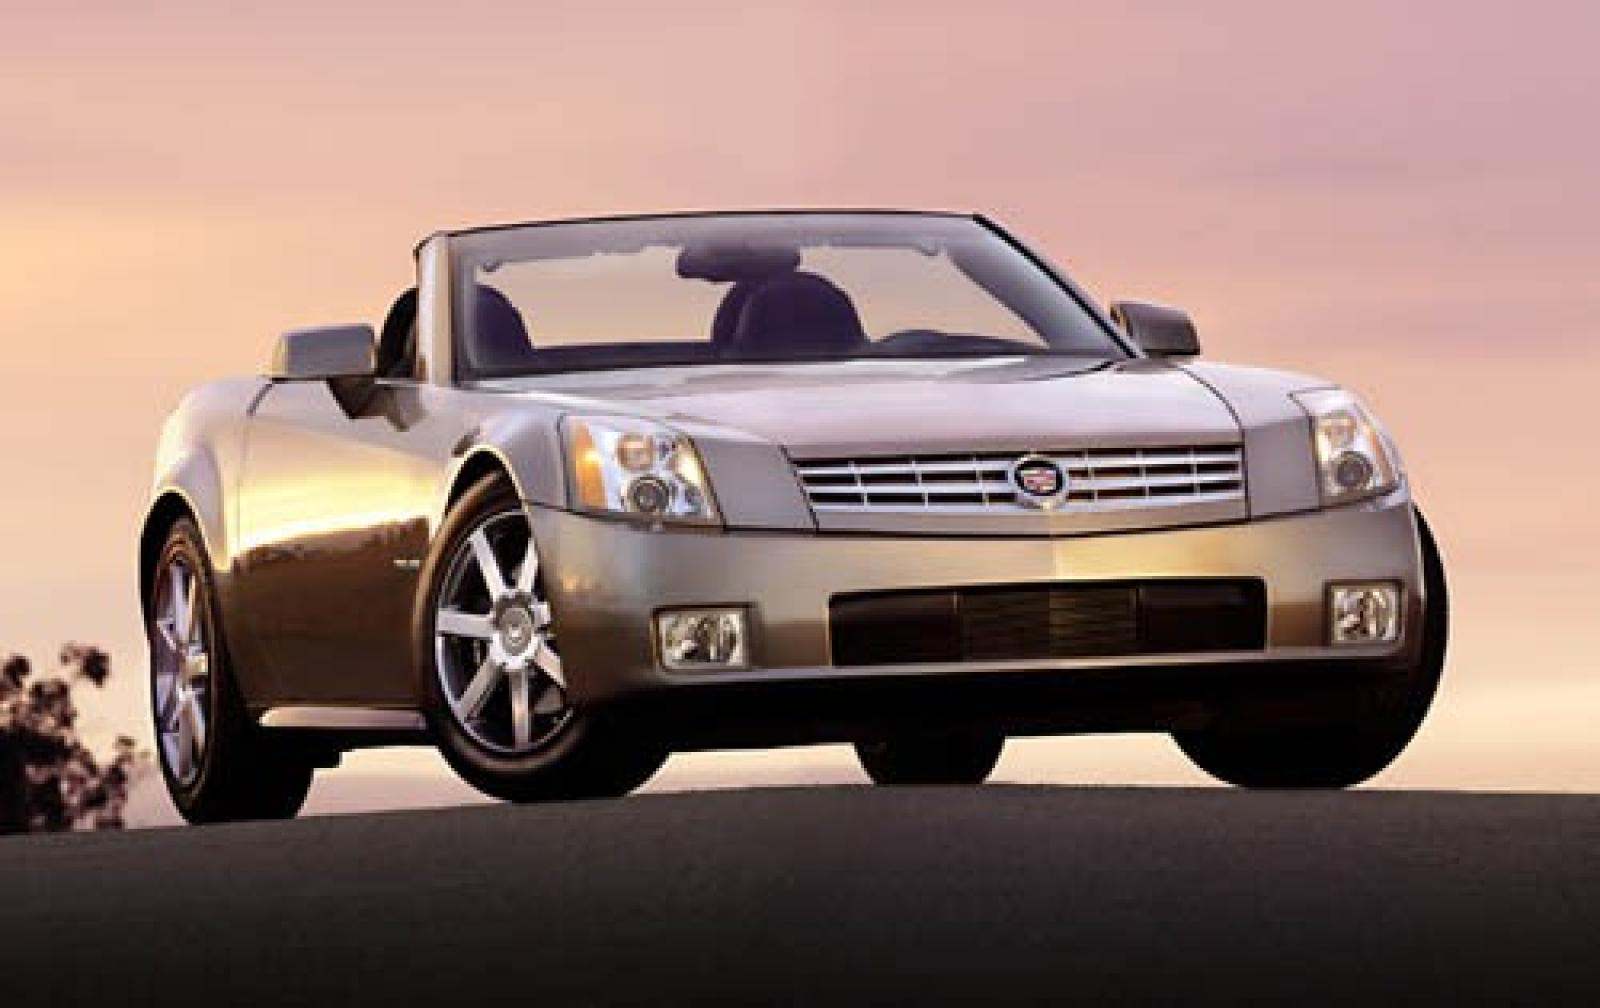 2006 Cadillac Xlr Information And Photos Zombiedrive Wiring Diagram 800 1024 1280 1600 Origin